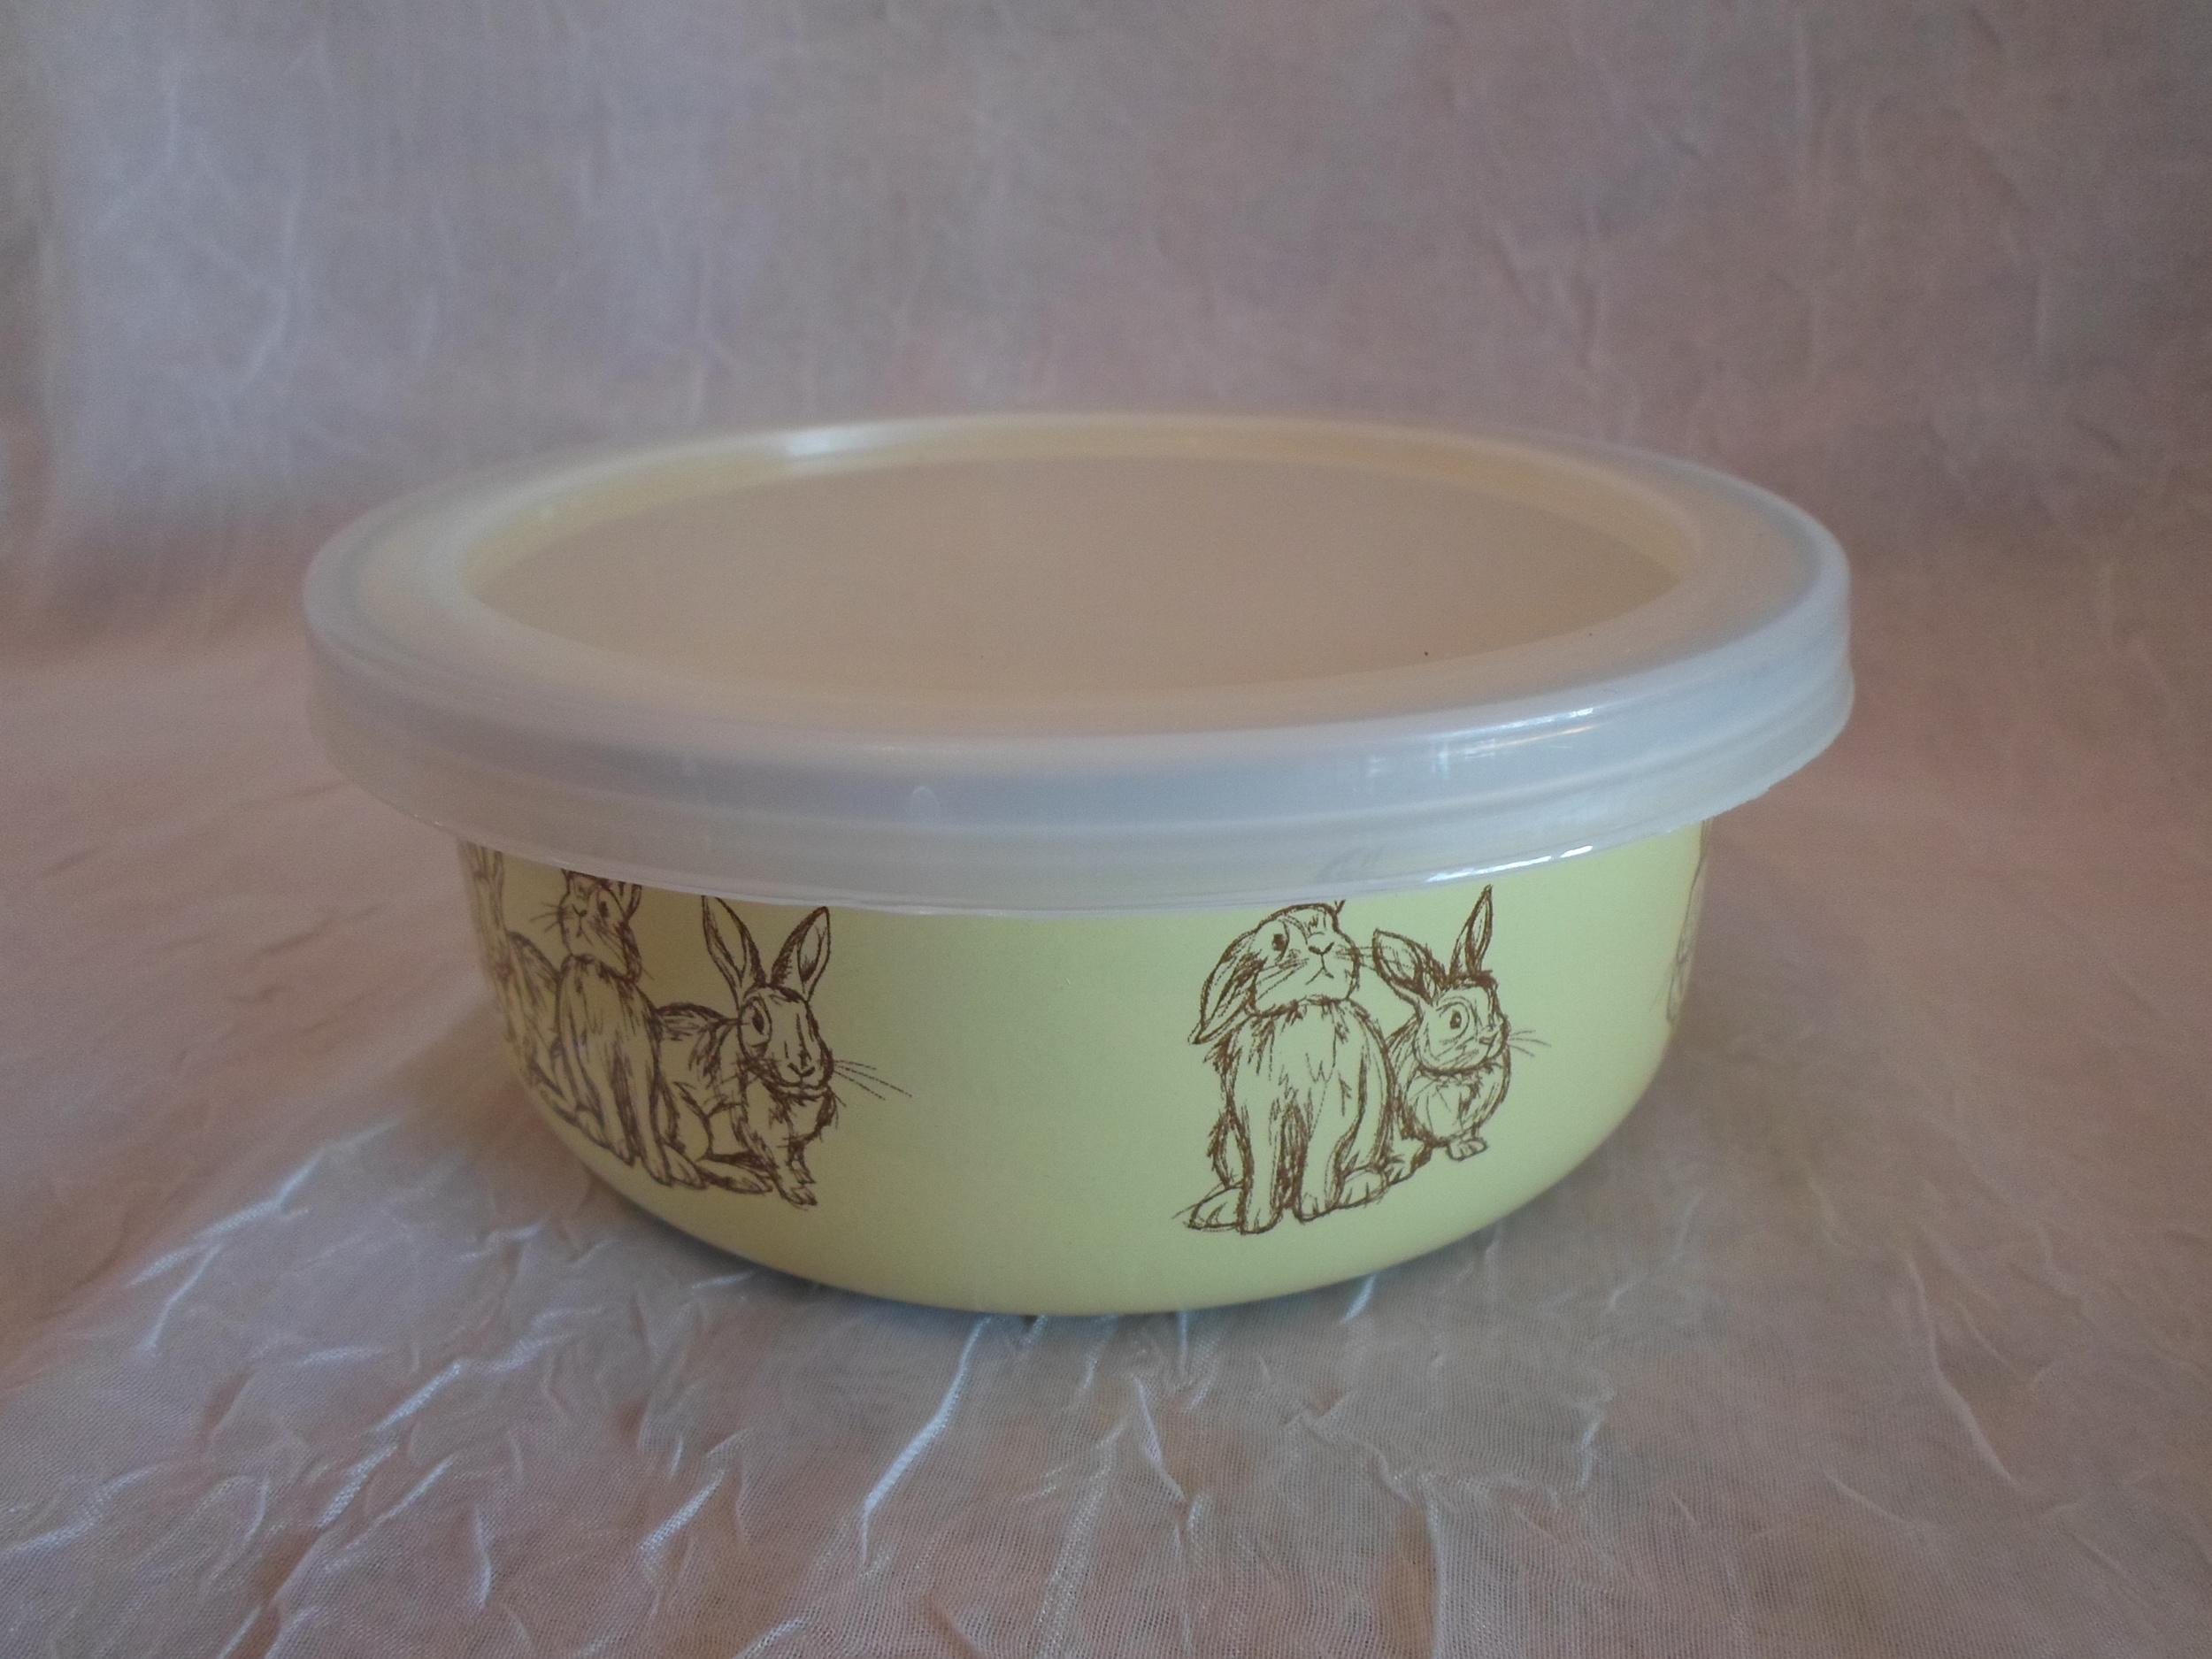 Golden Rabbit Enamelware Yellow Bunny Baby Bowl w/Lid    $9.95    Wants 1  purchased